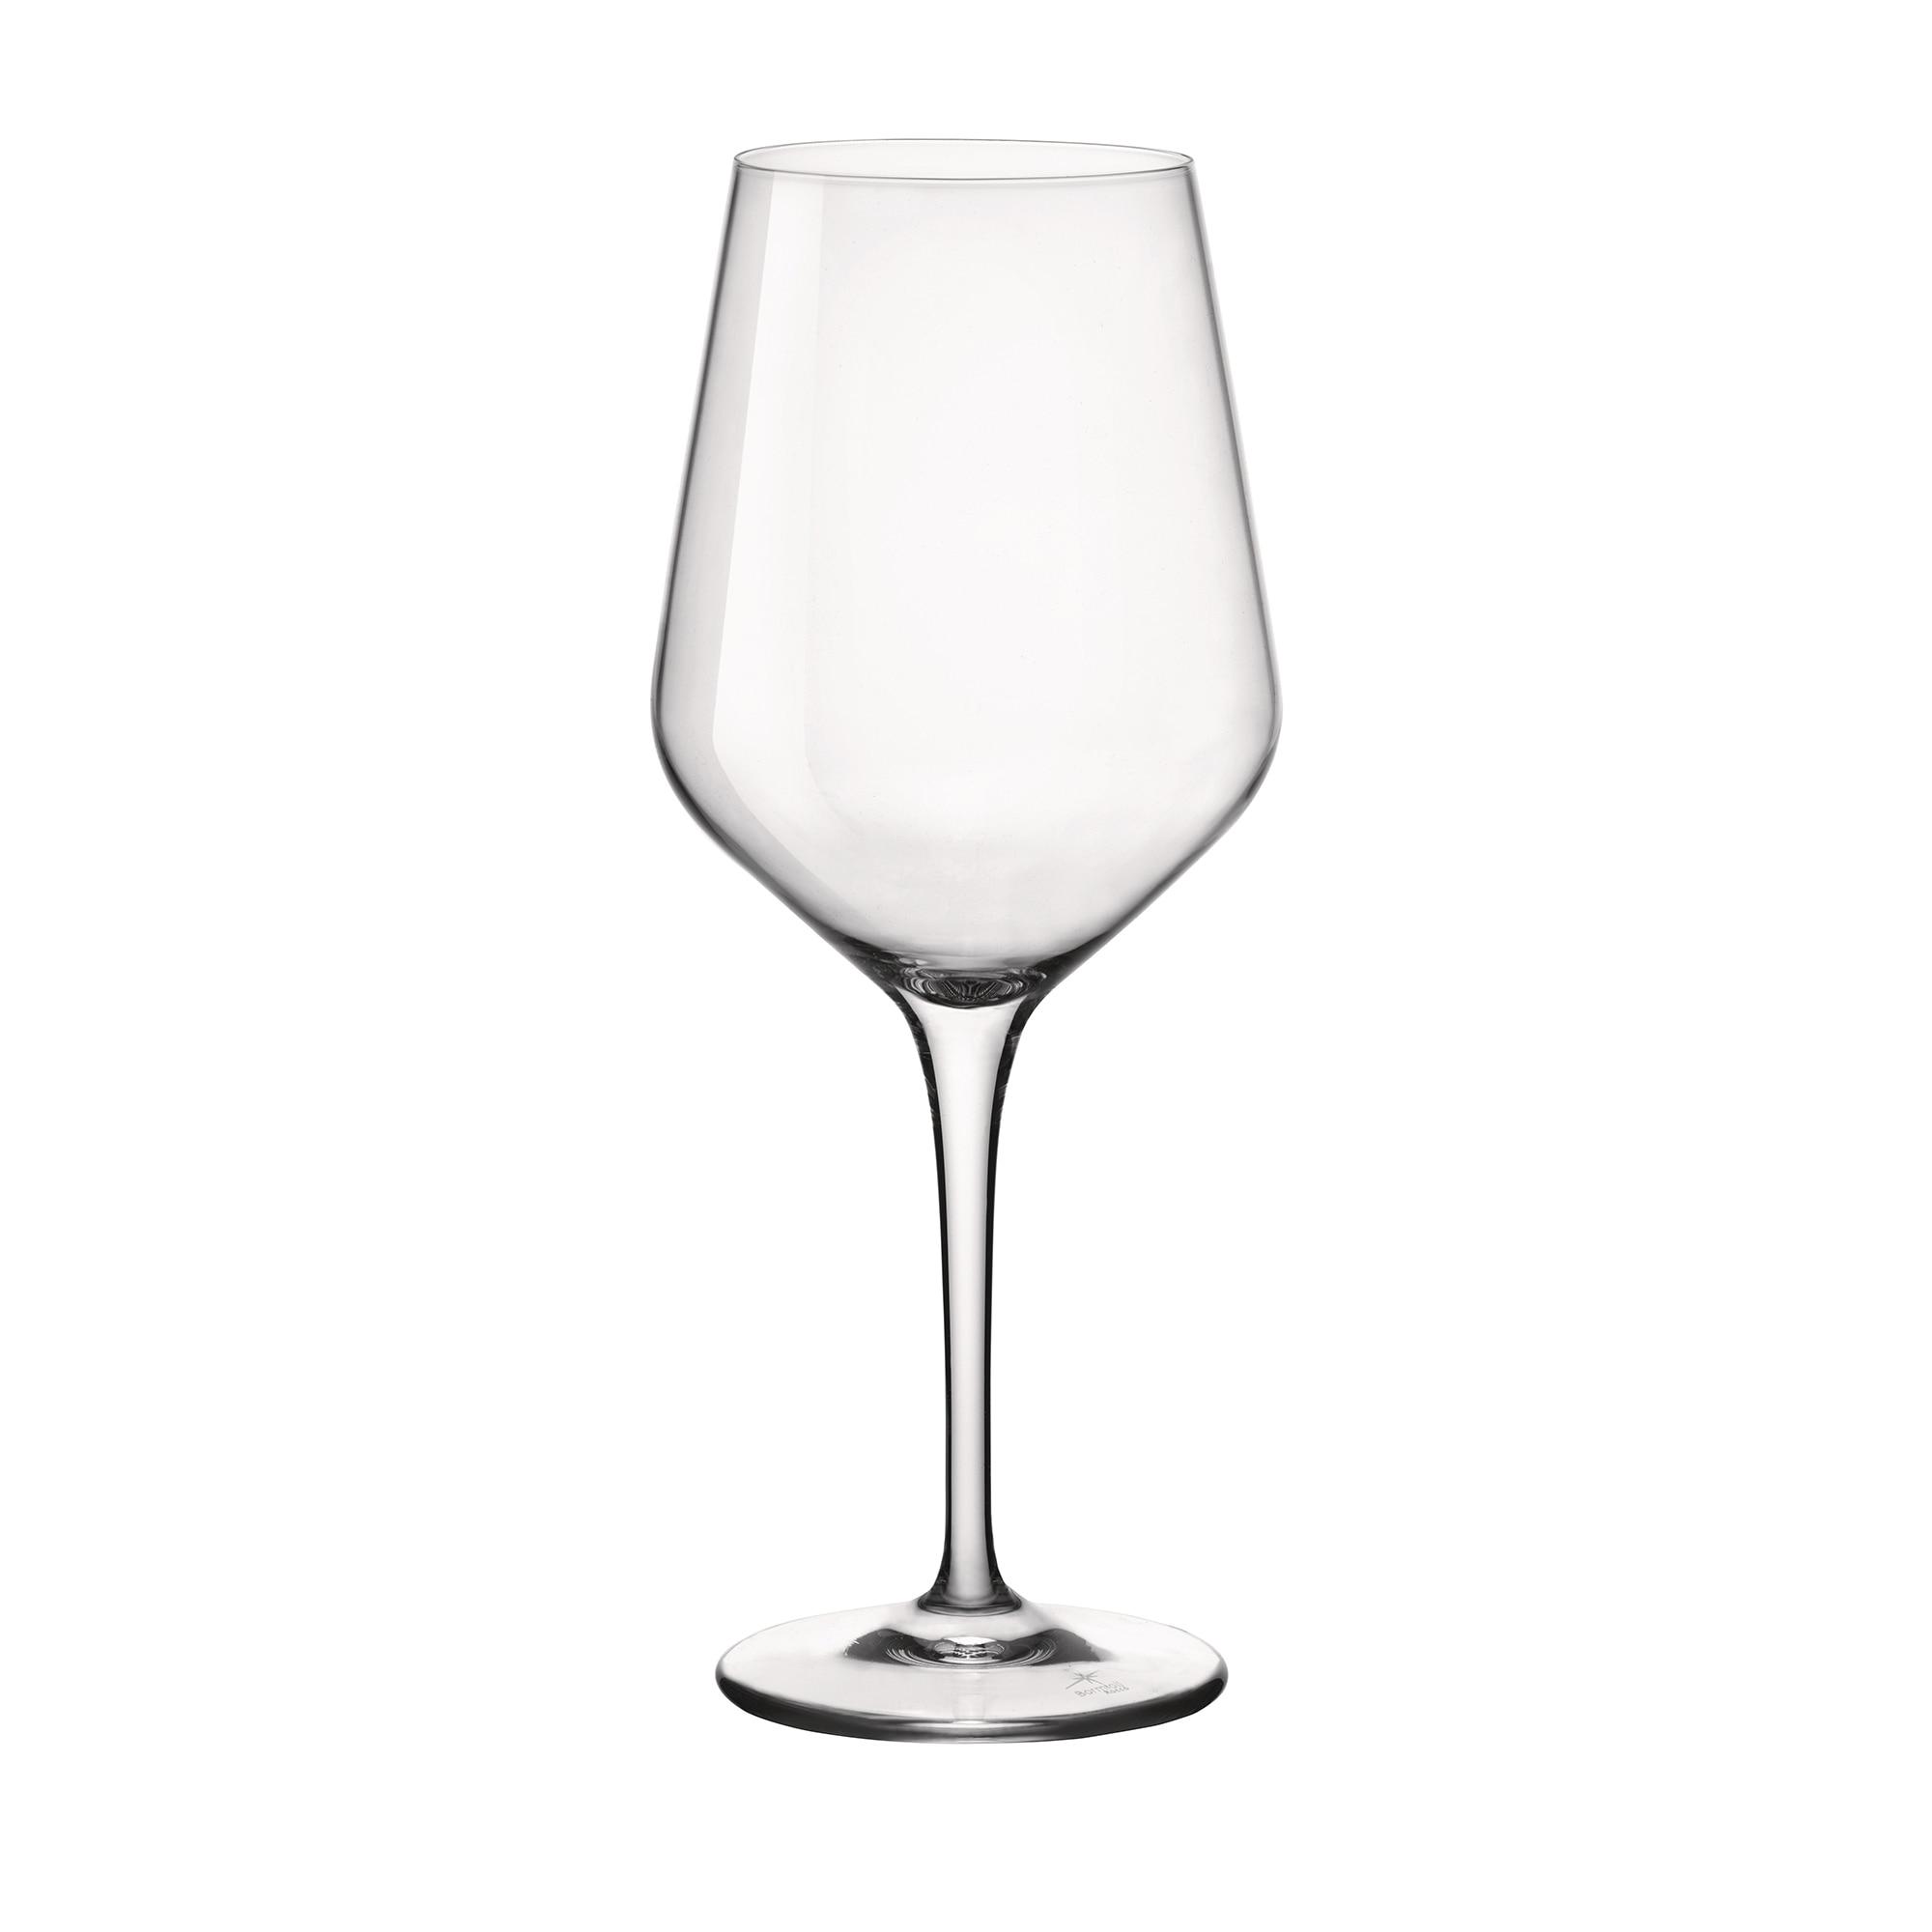 Fotografie Set 6 pahare vin rosu cu picior Bormioli Electra, 550 ml, sticla cristalina